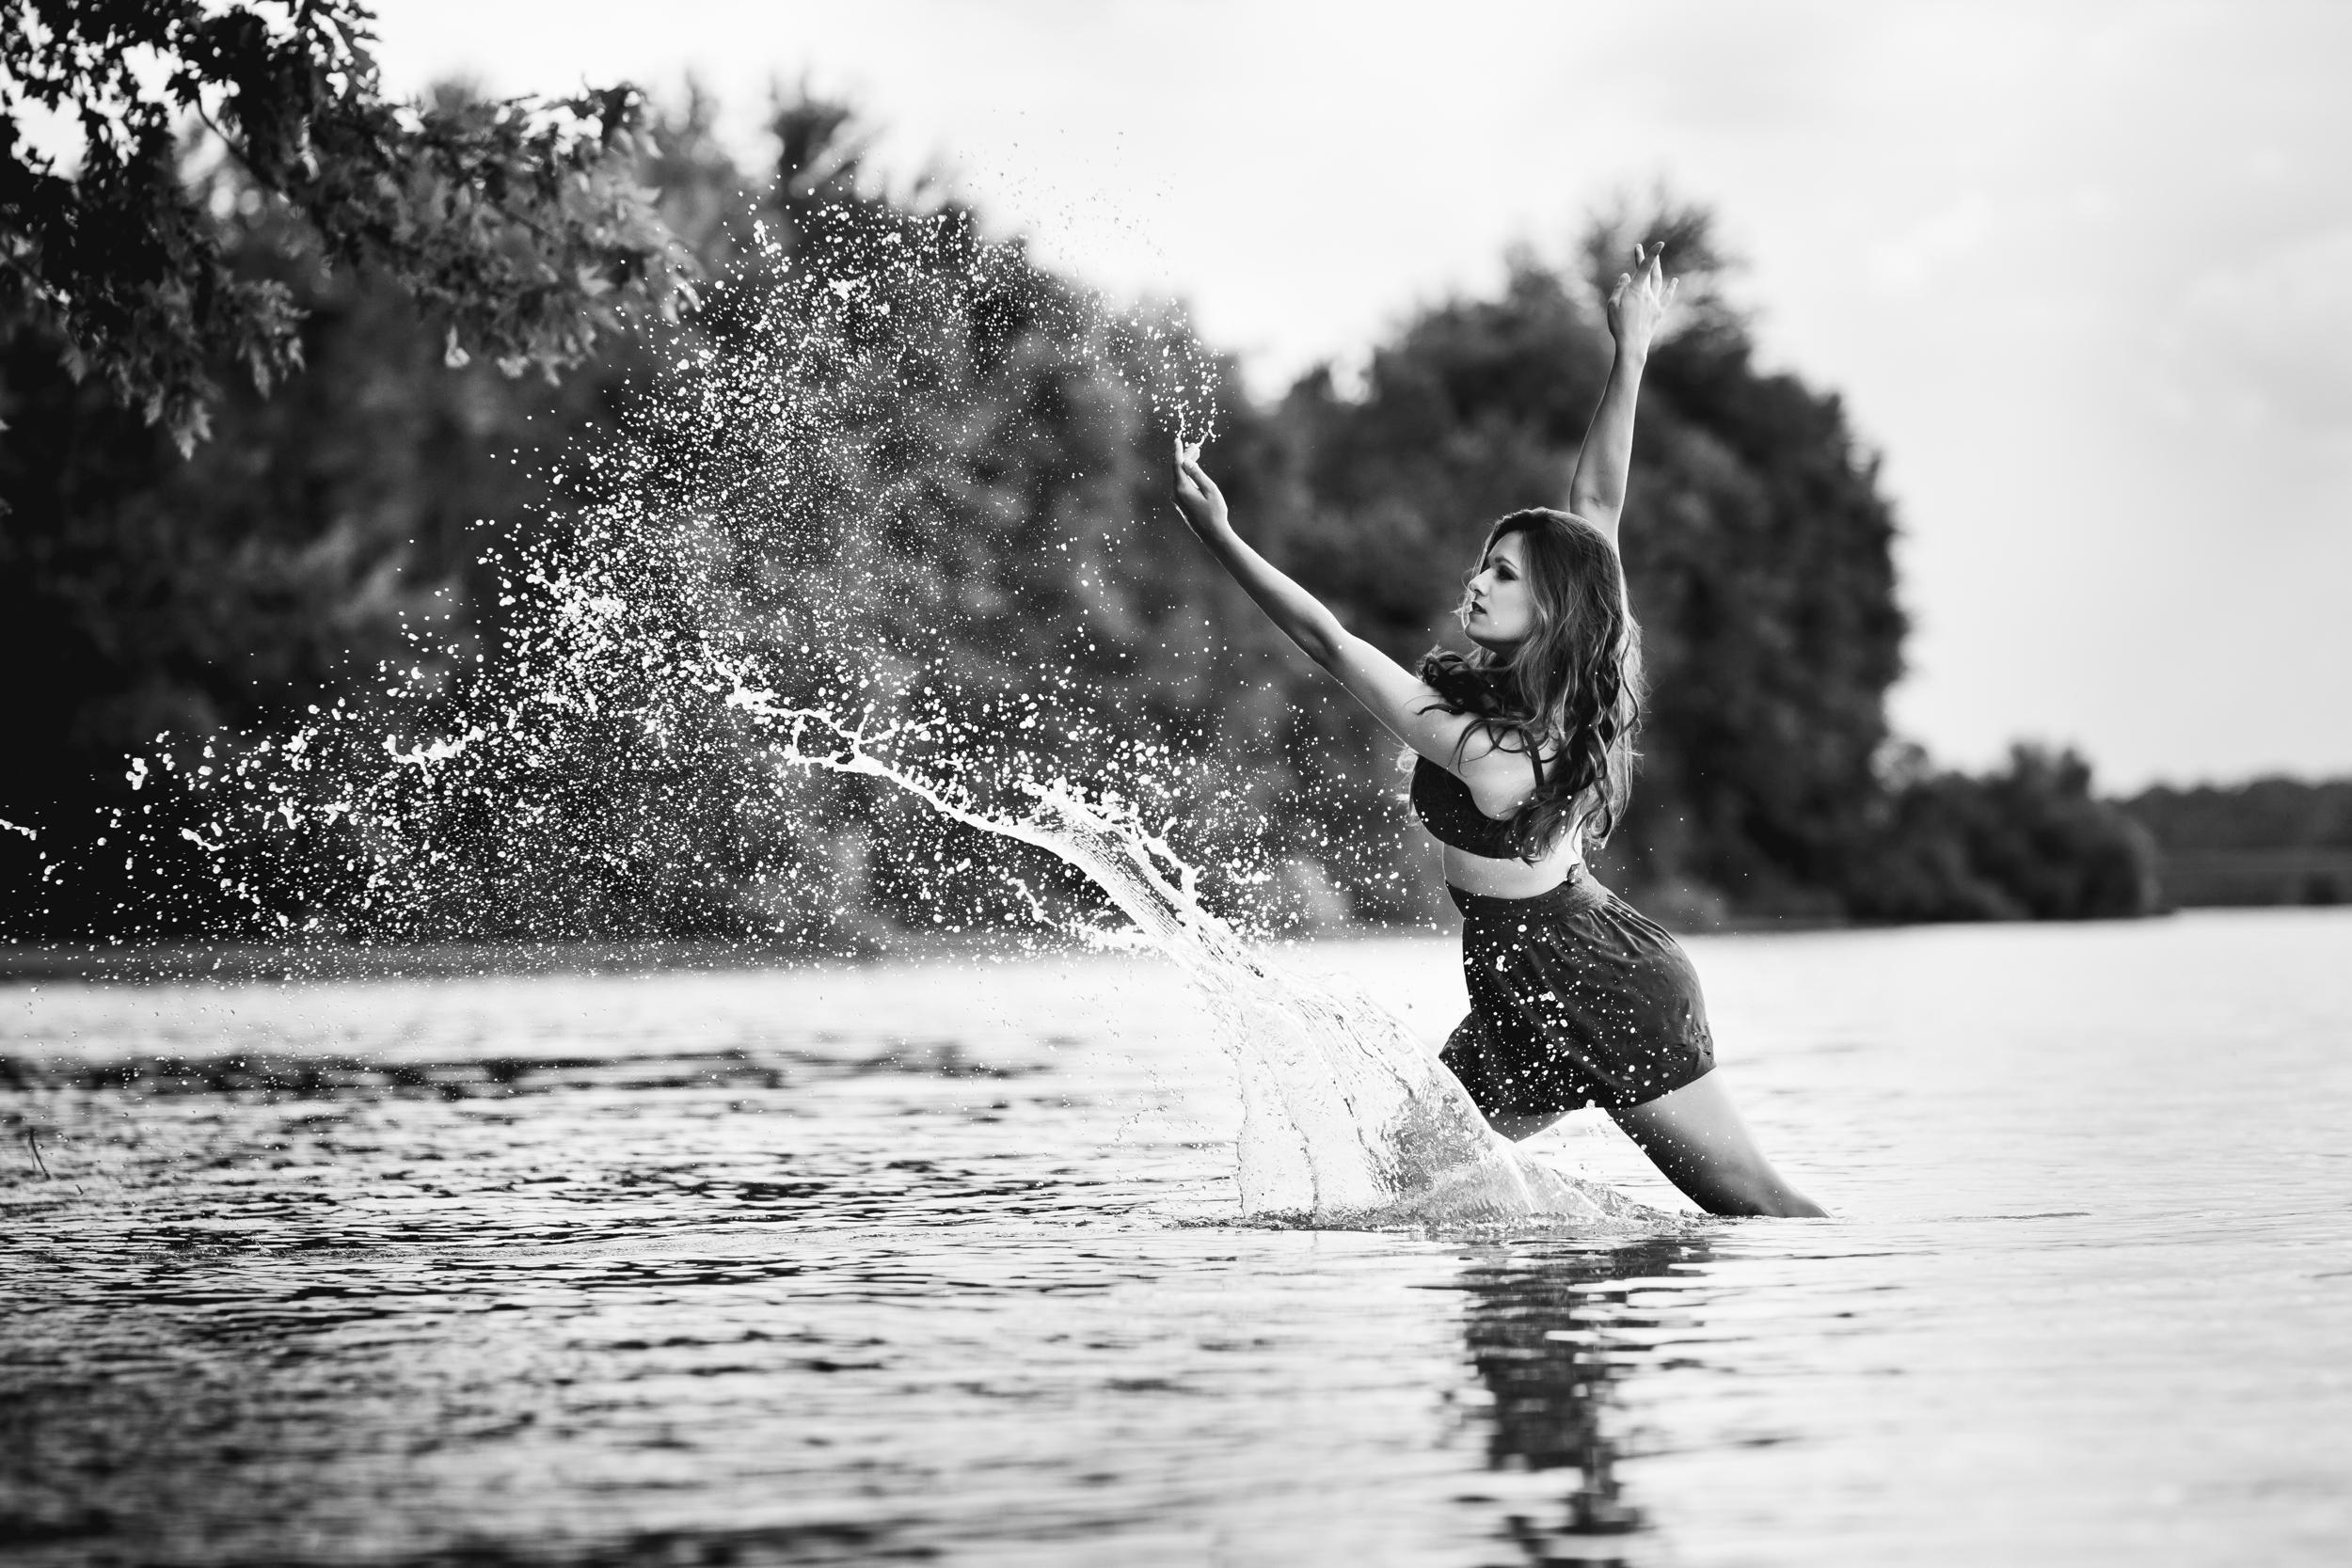 Splash 2.jpg